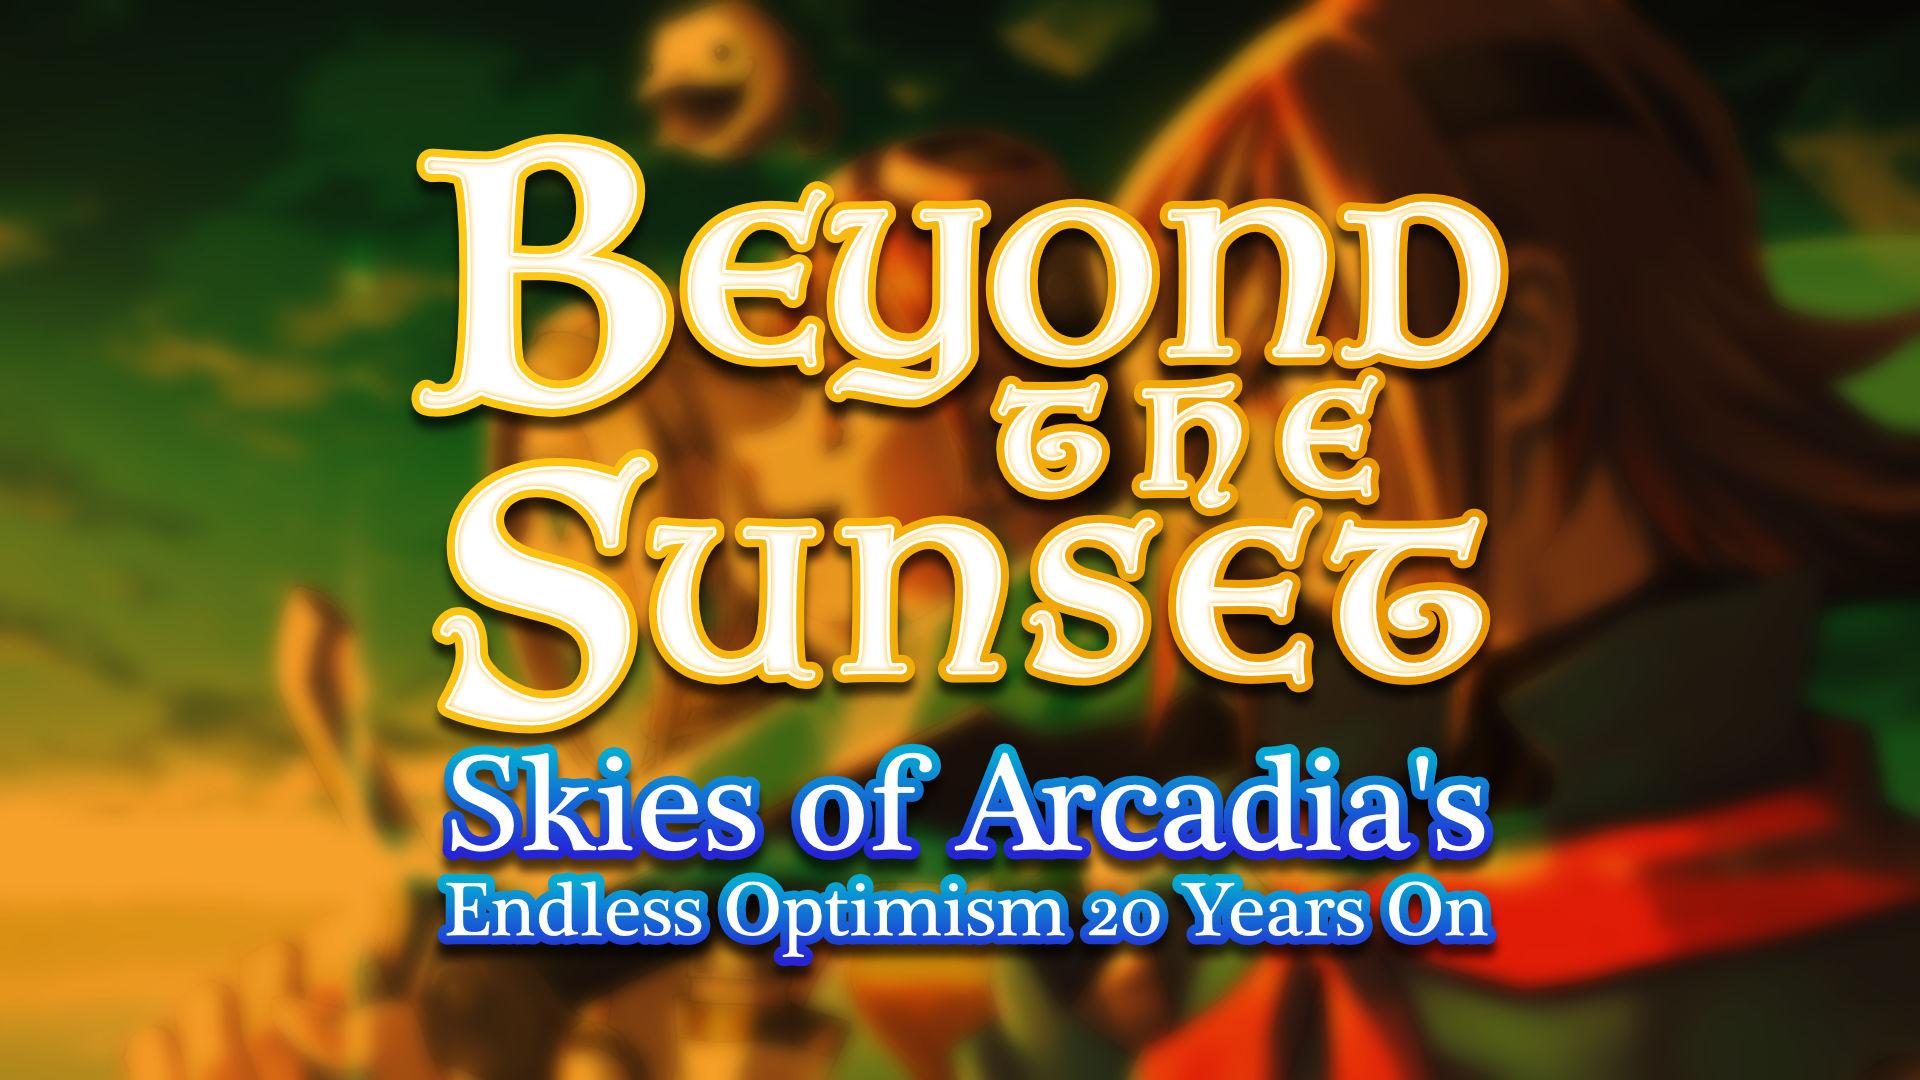 Beyond the Sunset Skies of Arcadia's Endless Optimism